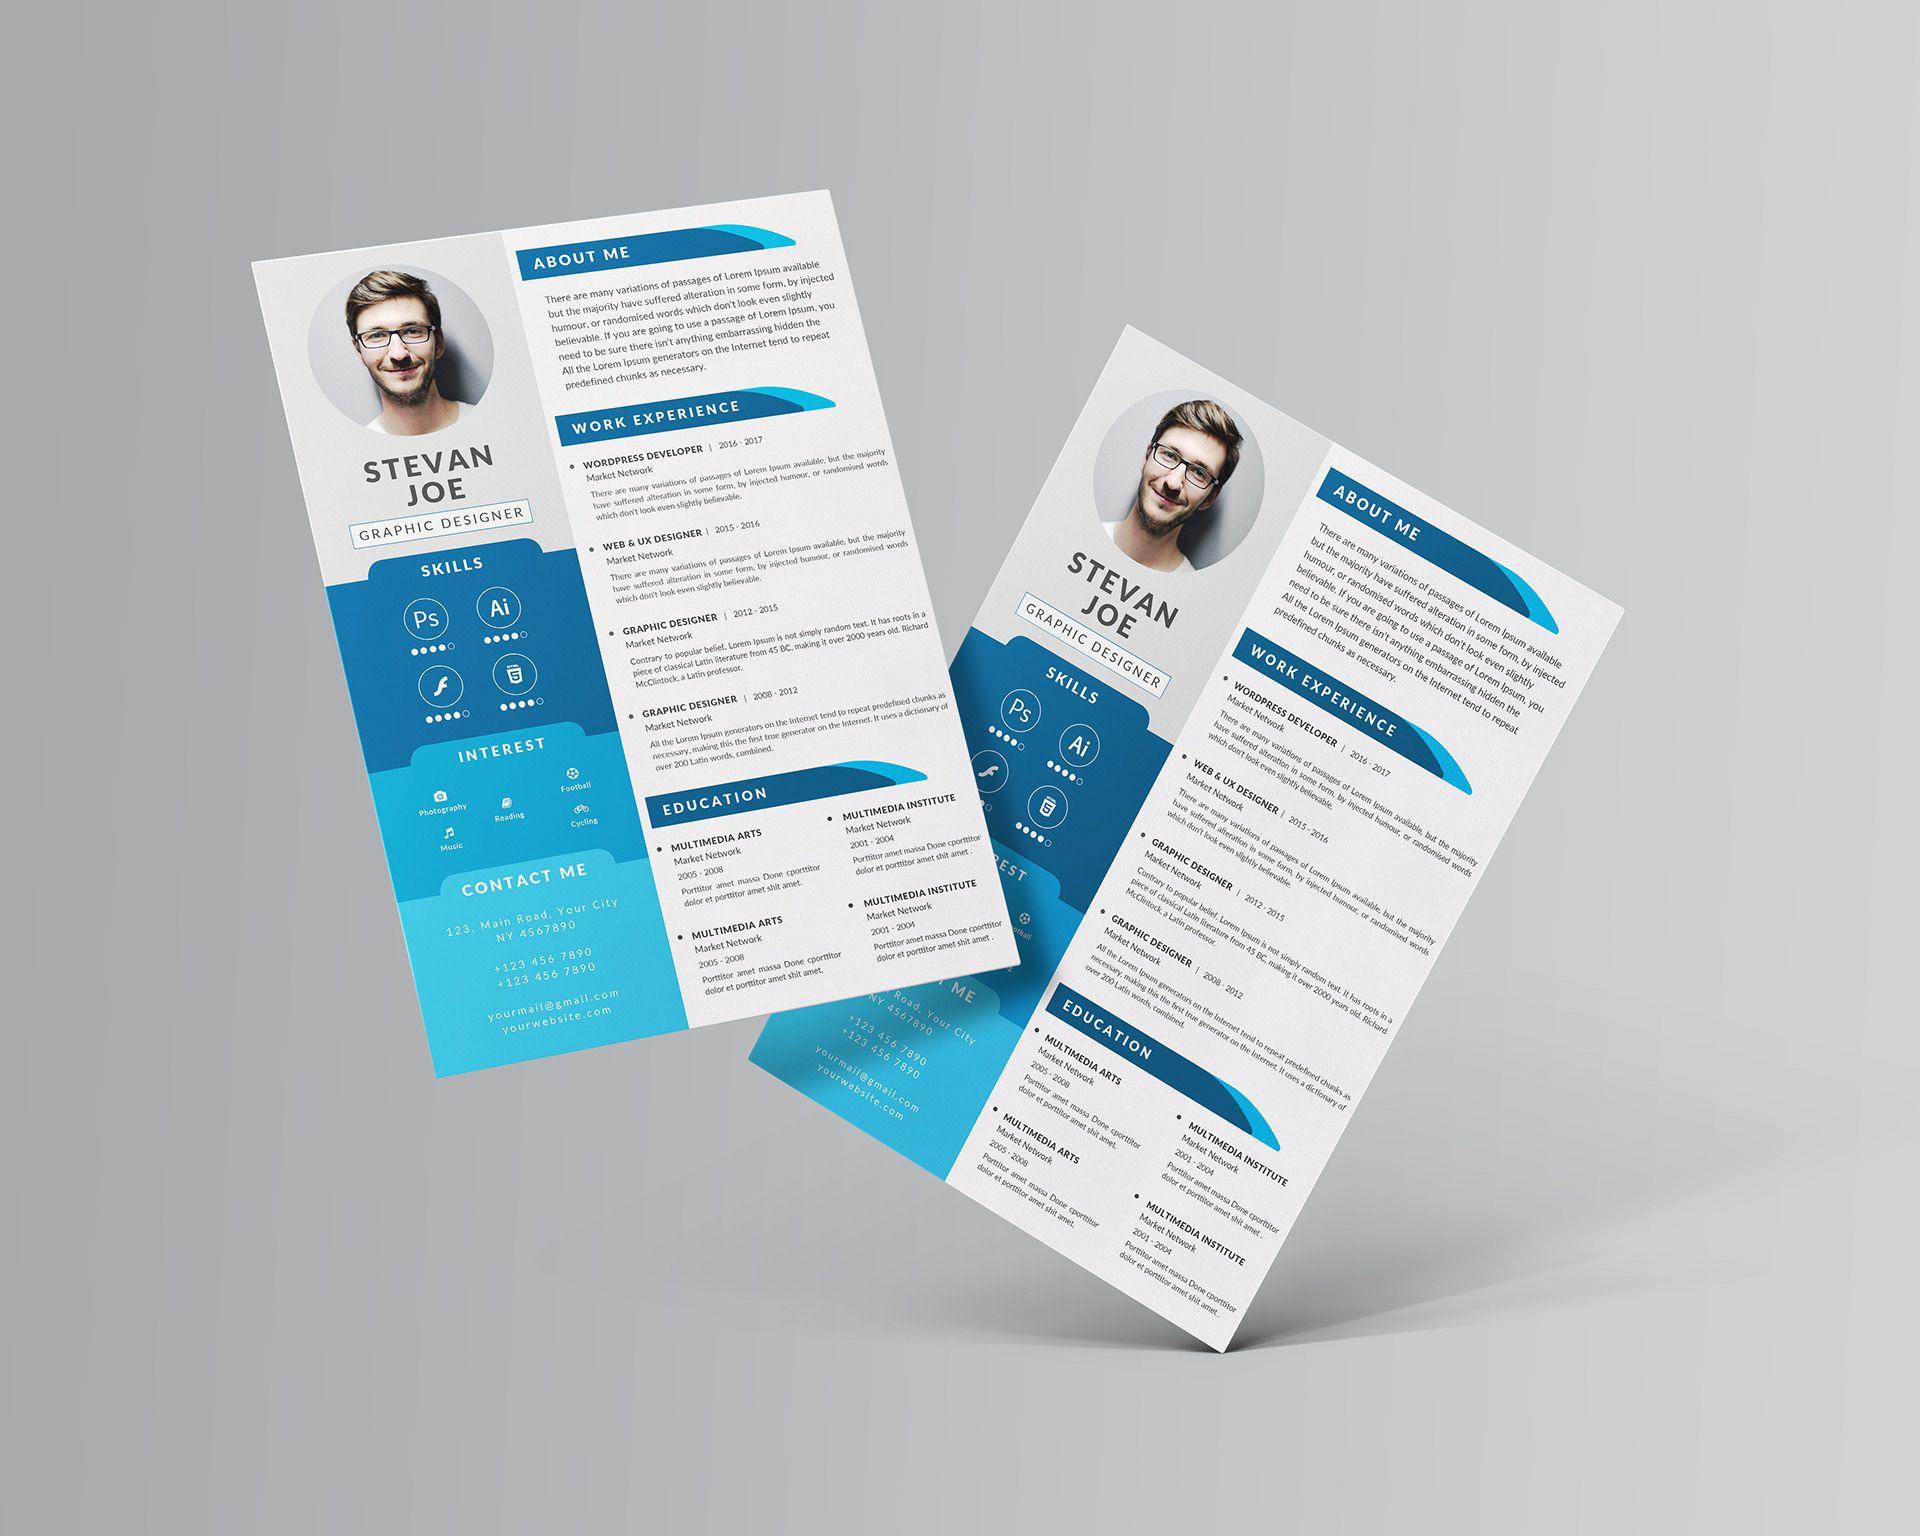 004 Impressive Photoshop Resume Template Free Psd Idea Full